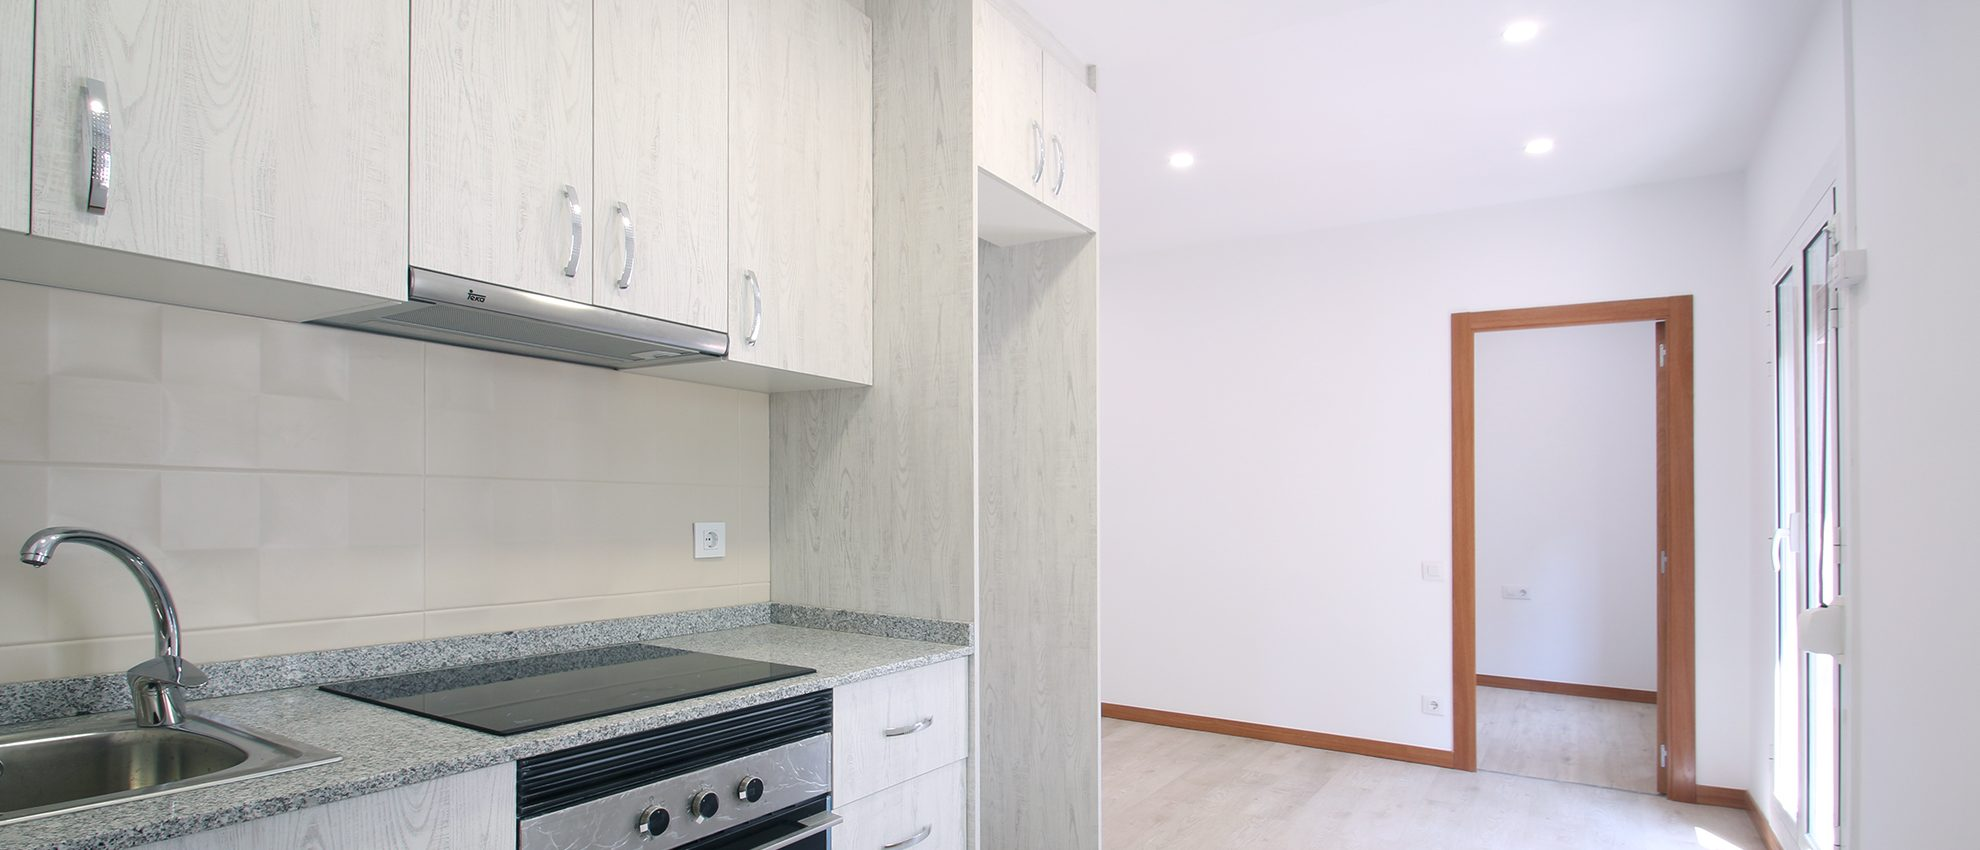 Vila Joiosa 4 apartment